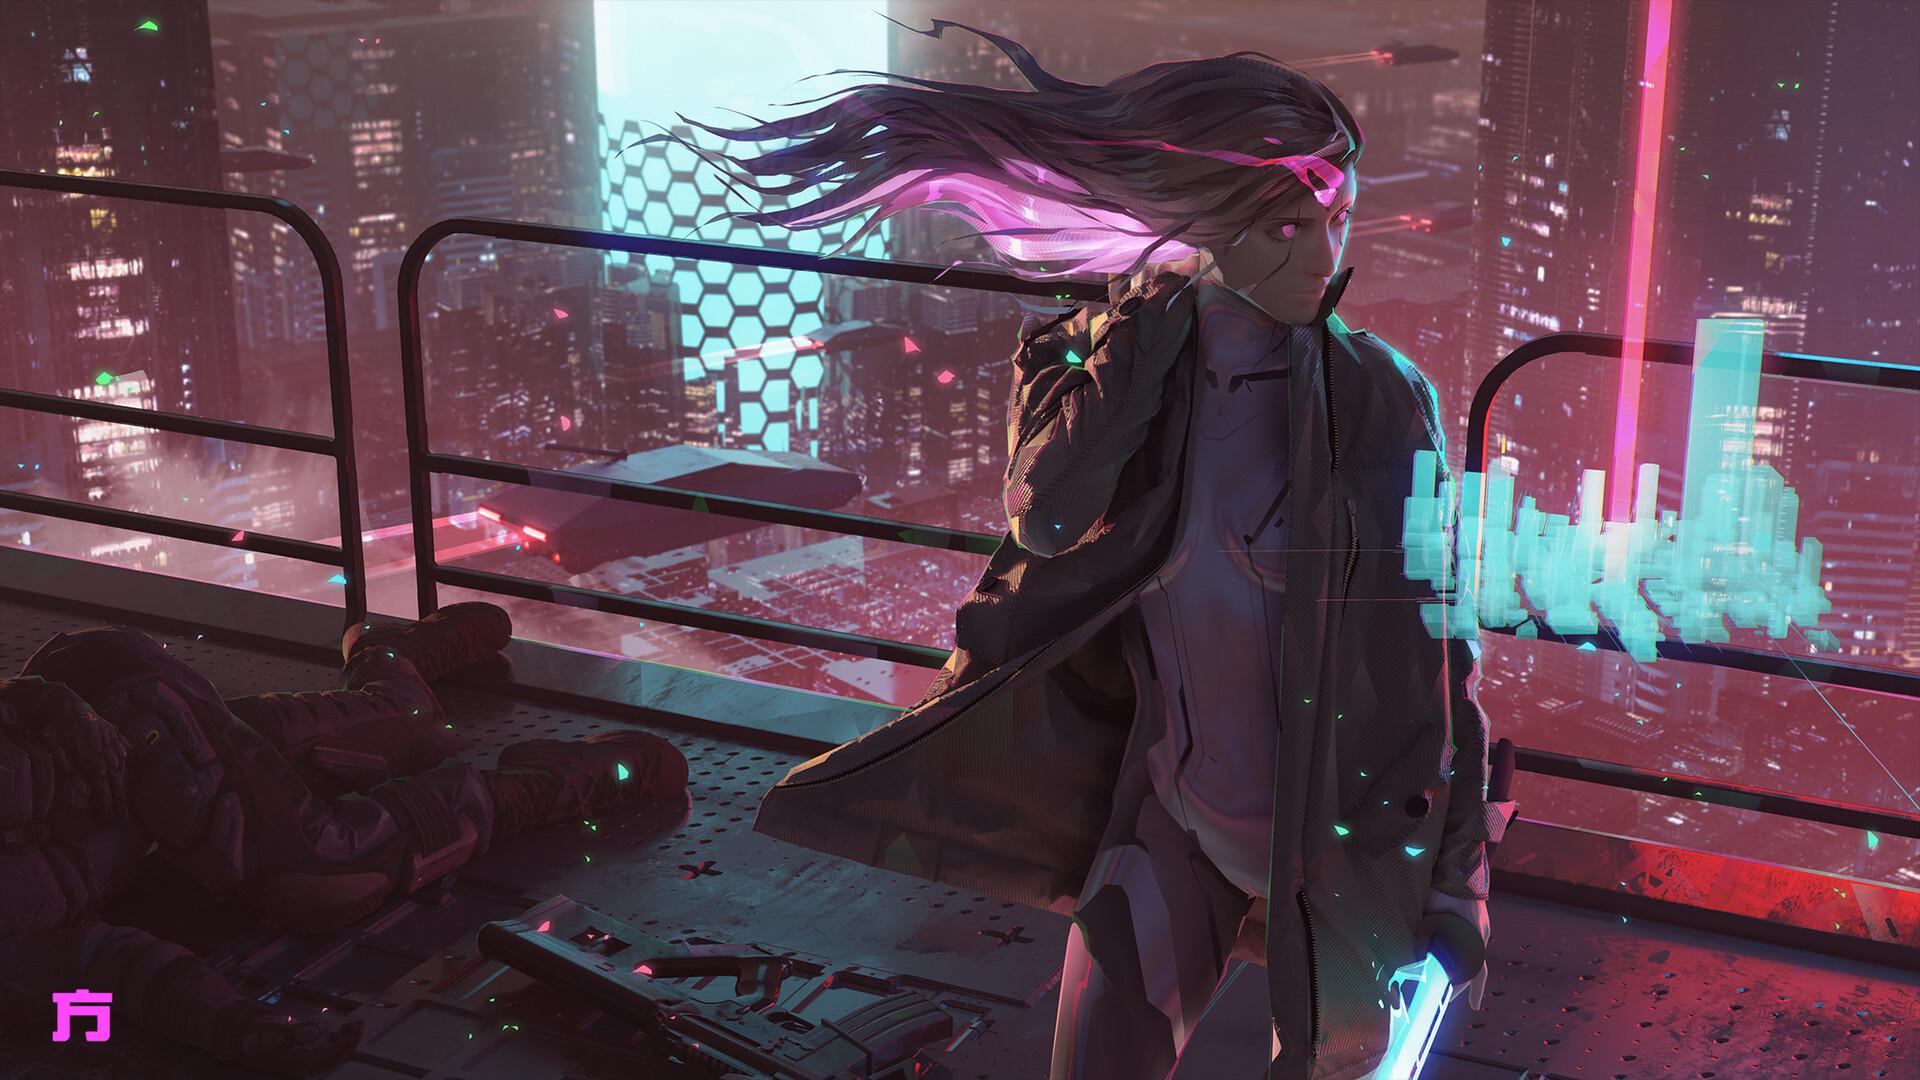 General 1920x1080 science fiction ArtStation cyborg Chinese character Chin Fong long hair futuristic city cyberpunk